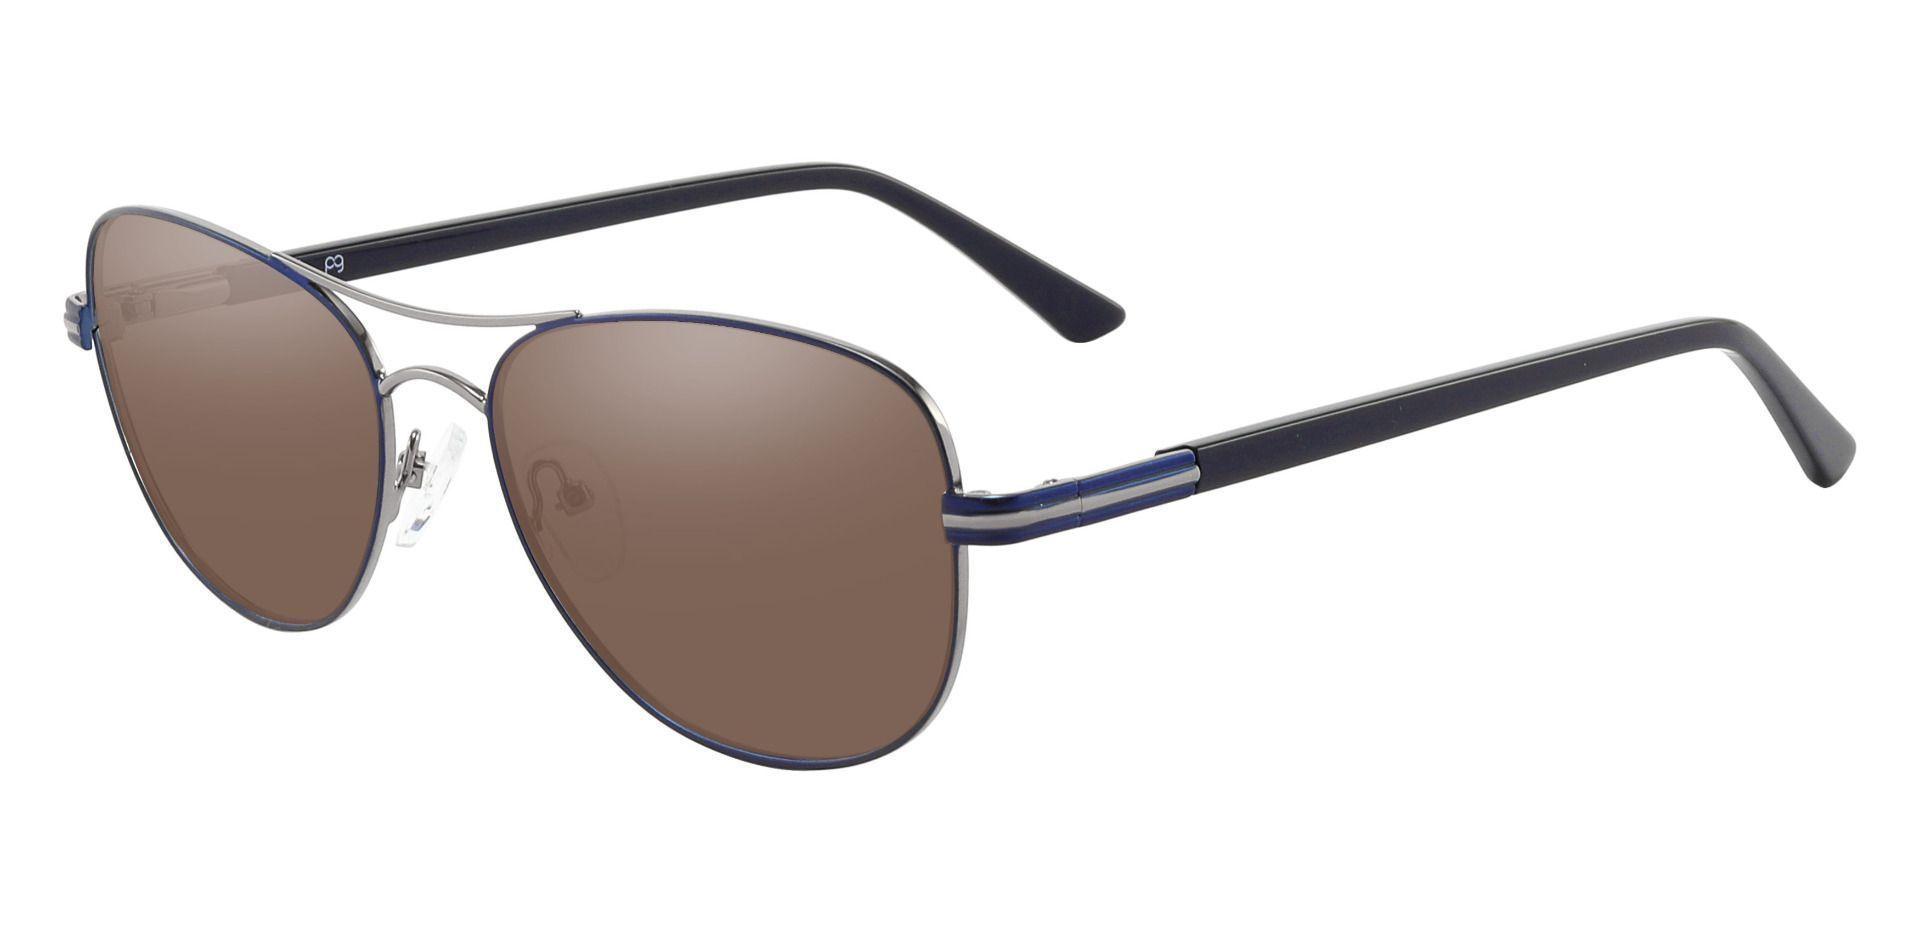 Reeves Aviator Prescription Sunglasses - Blue Frame With Brown Lenses